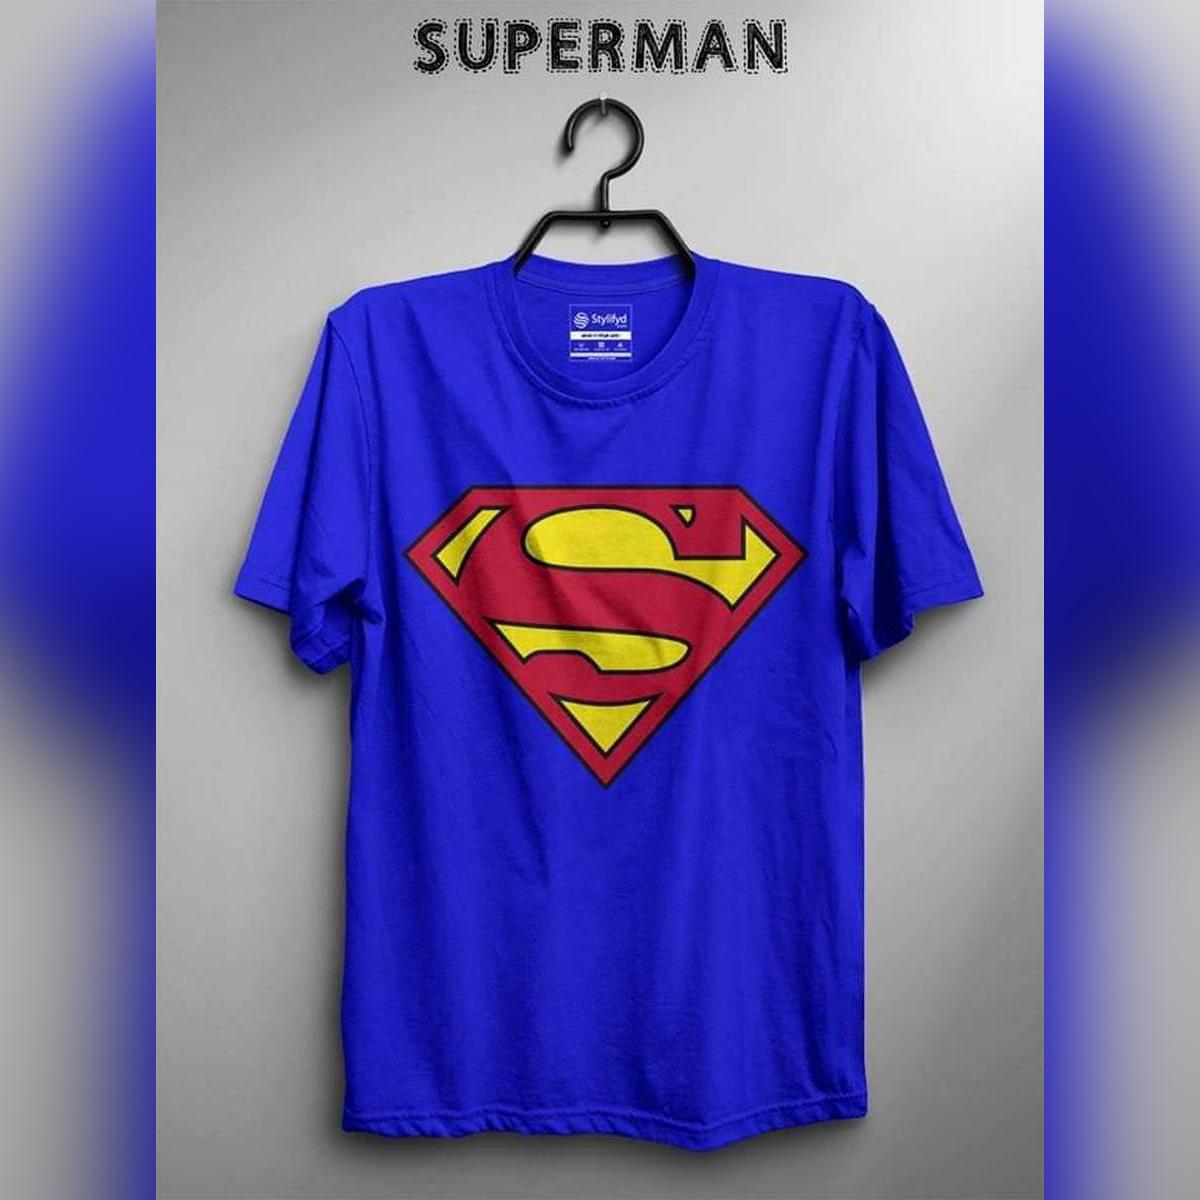 Superman Amazing Smart Fit T Shirt Men O-Neck Half Sleeves Tee Shirt Round Neck Cotton TShirt Casual Tshirt TShirt Summer Wear Spring Wear Tops